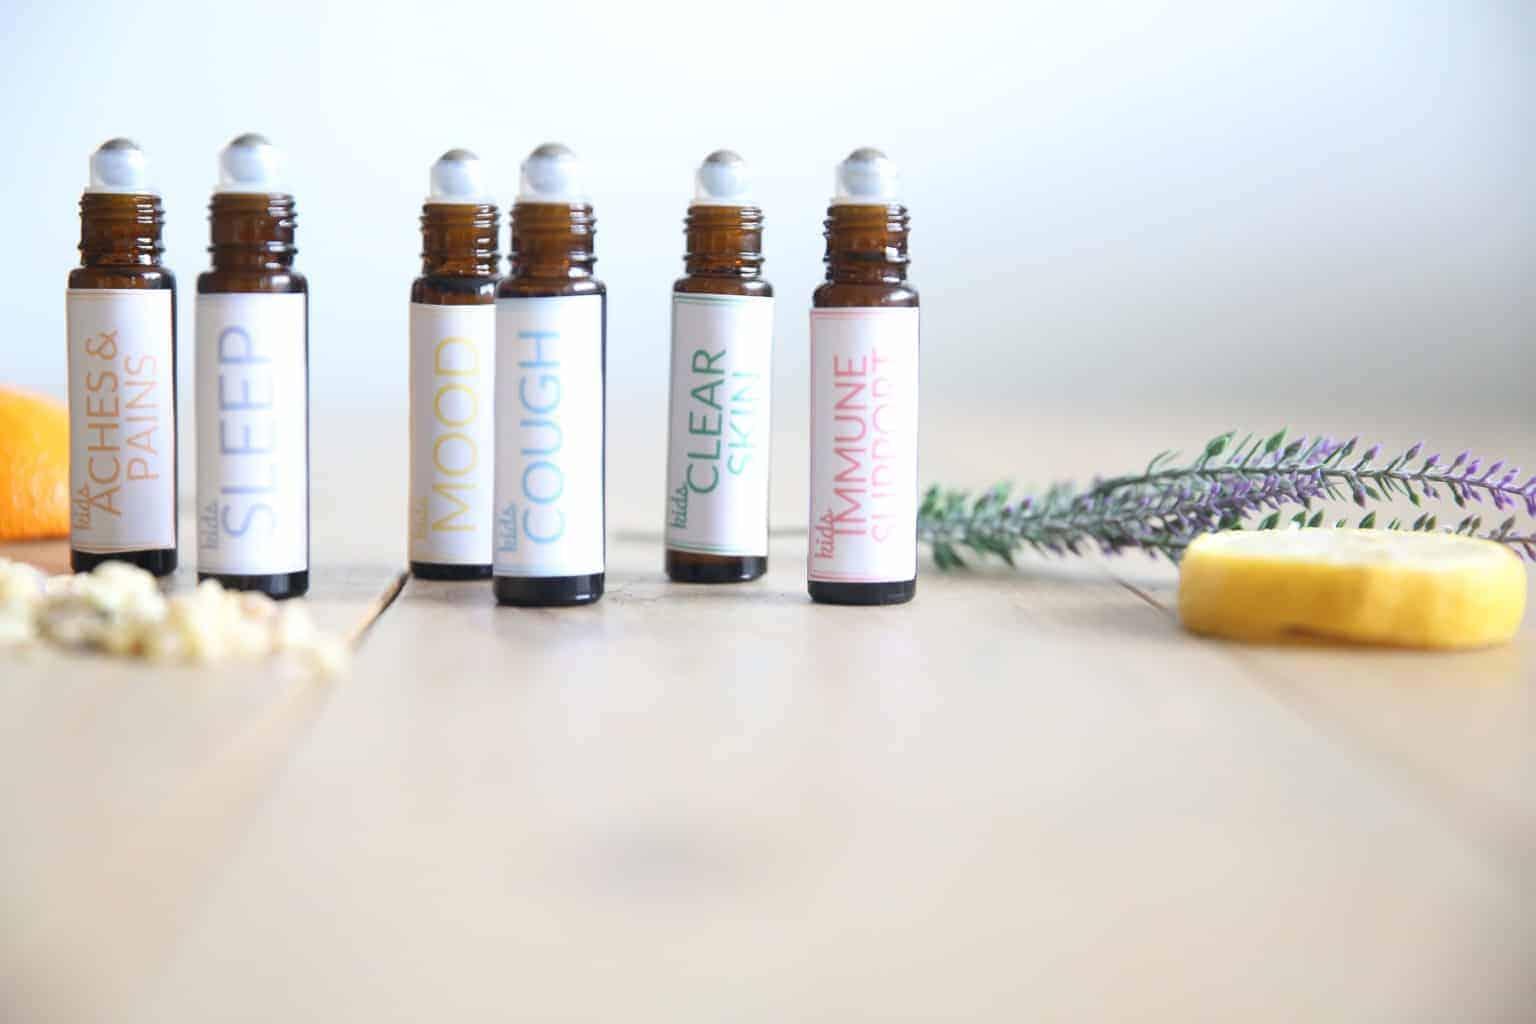 kids essential oils roller bottles on wooden table